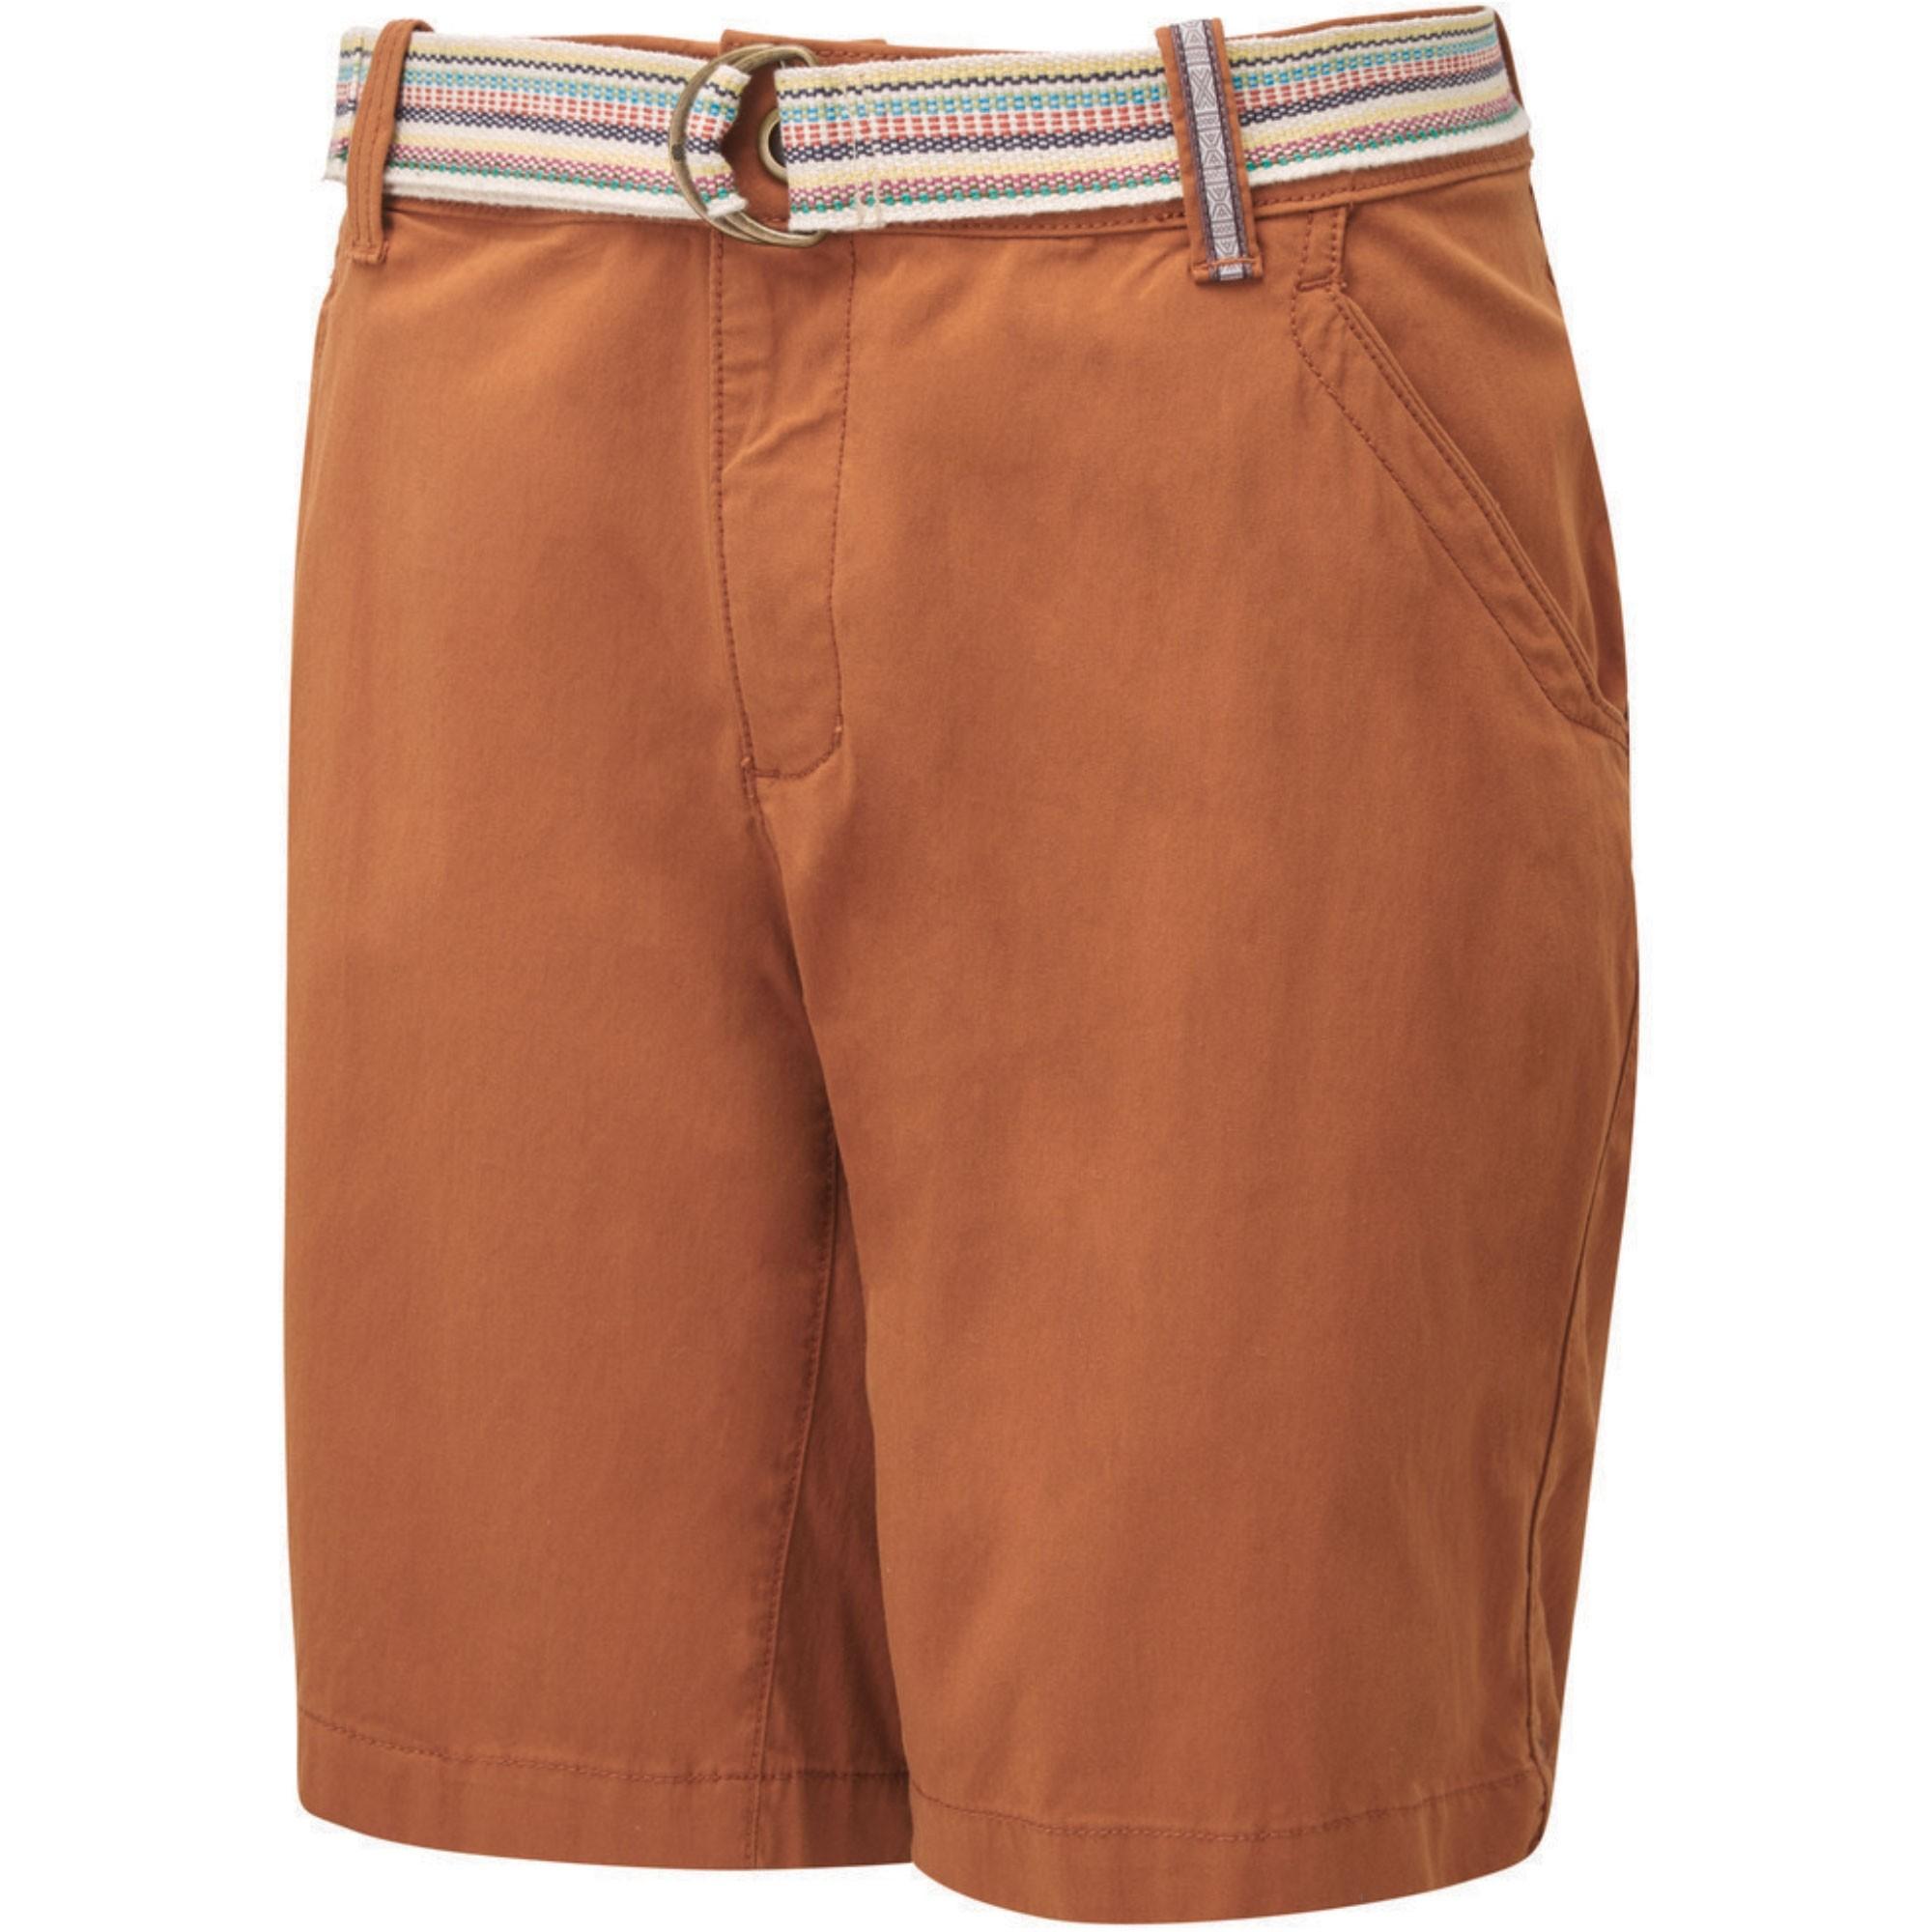 SHERPA - Women's Mirik Shorts - Pital